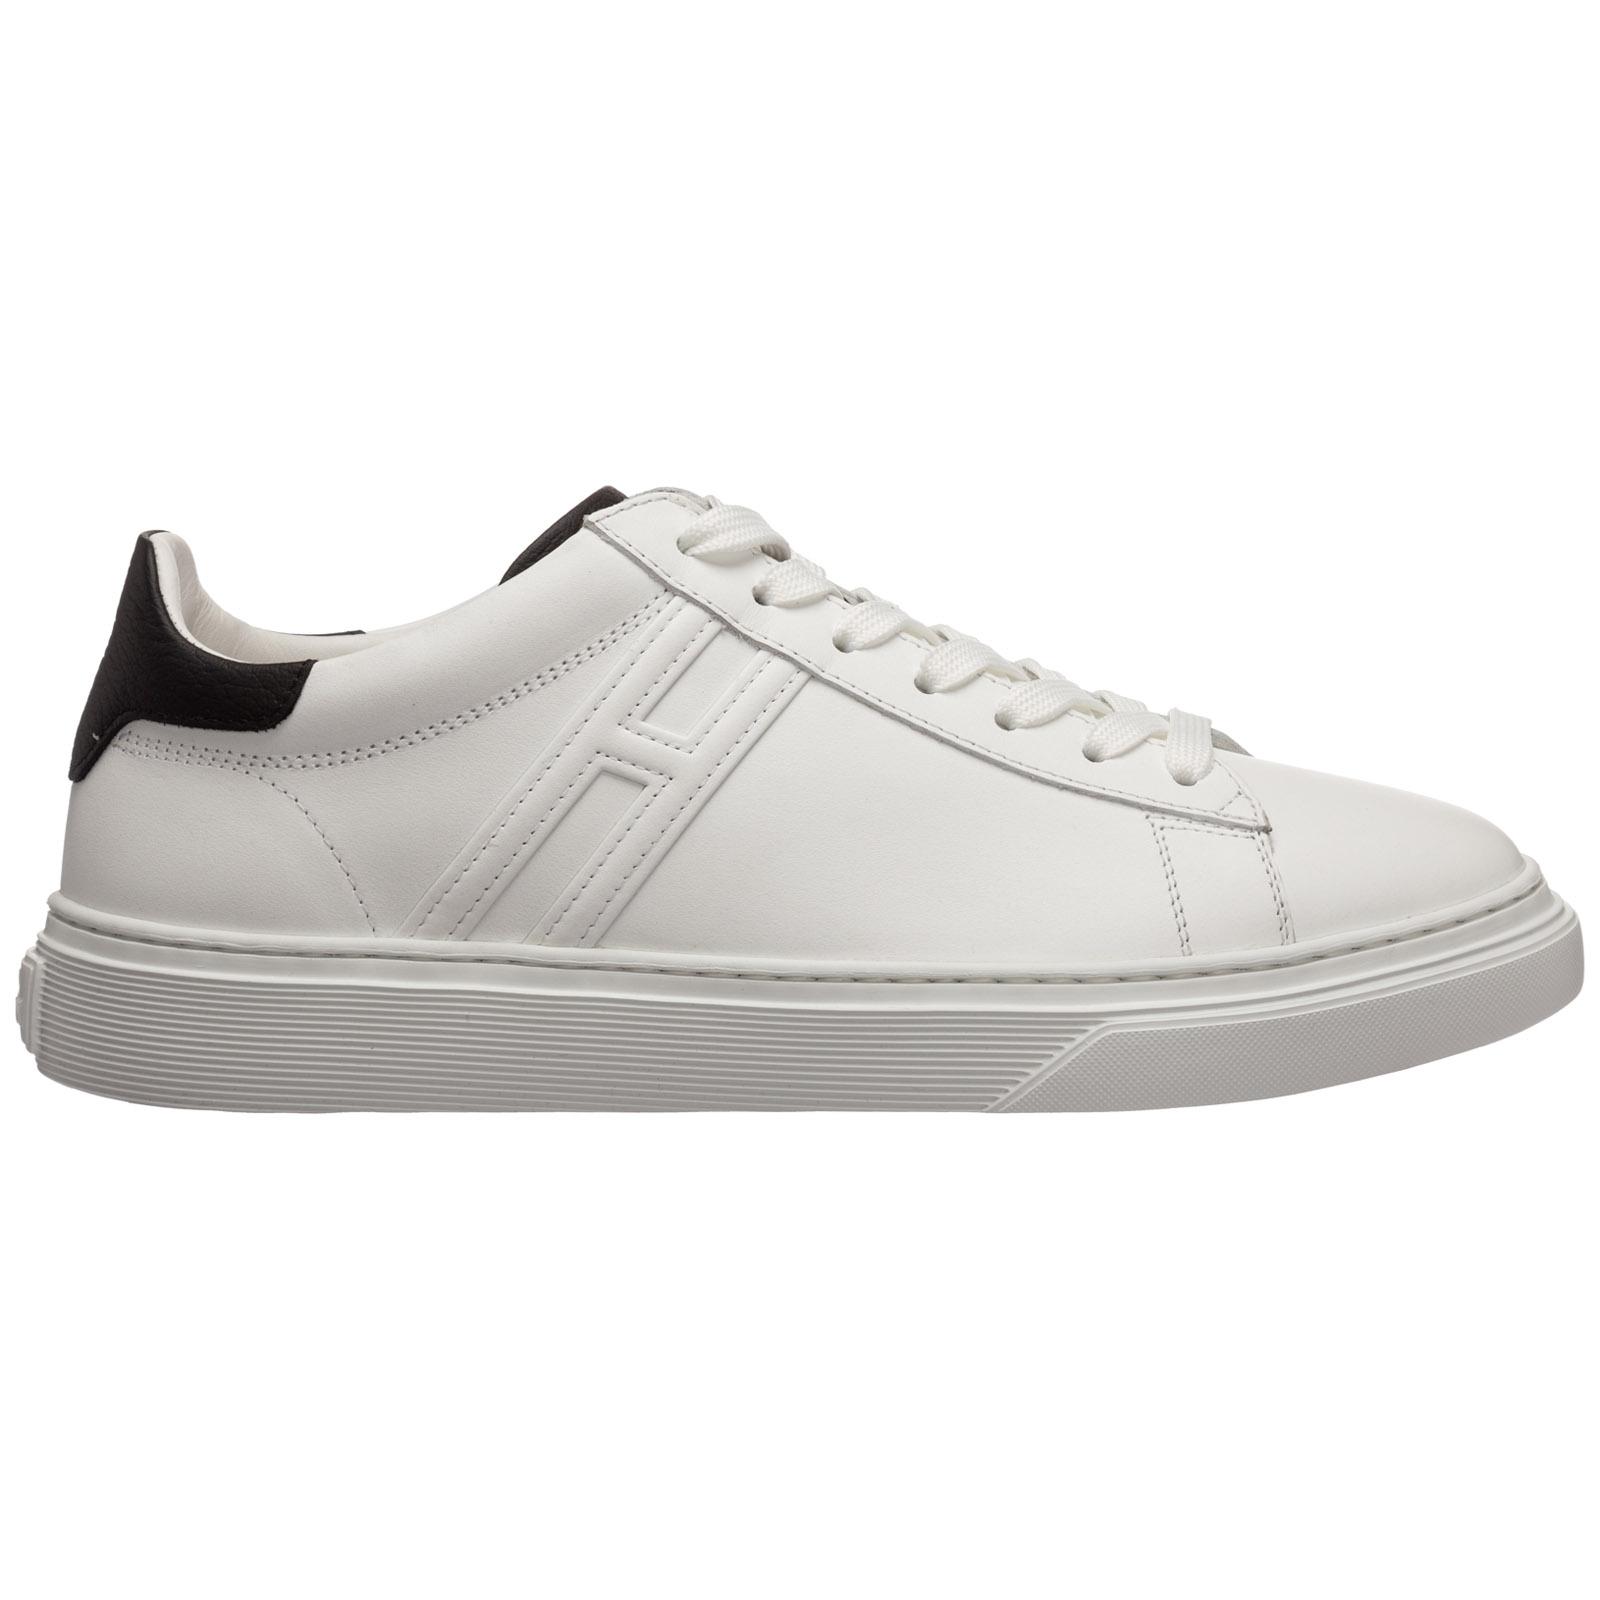 Scarpe sneakers uomo in pelle h365